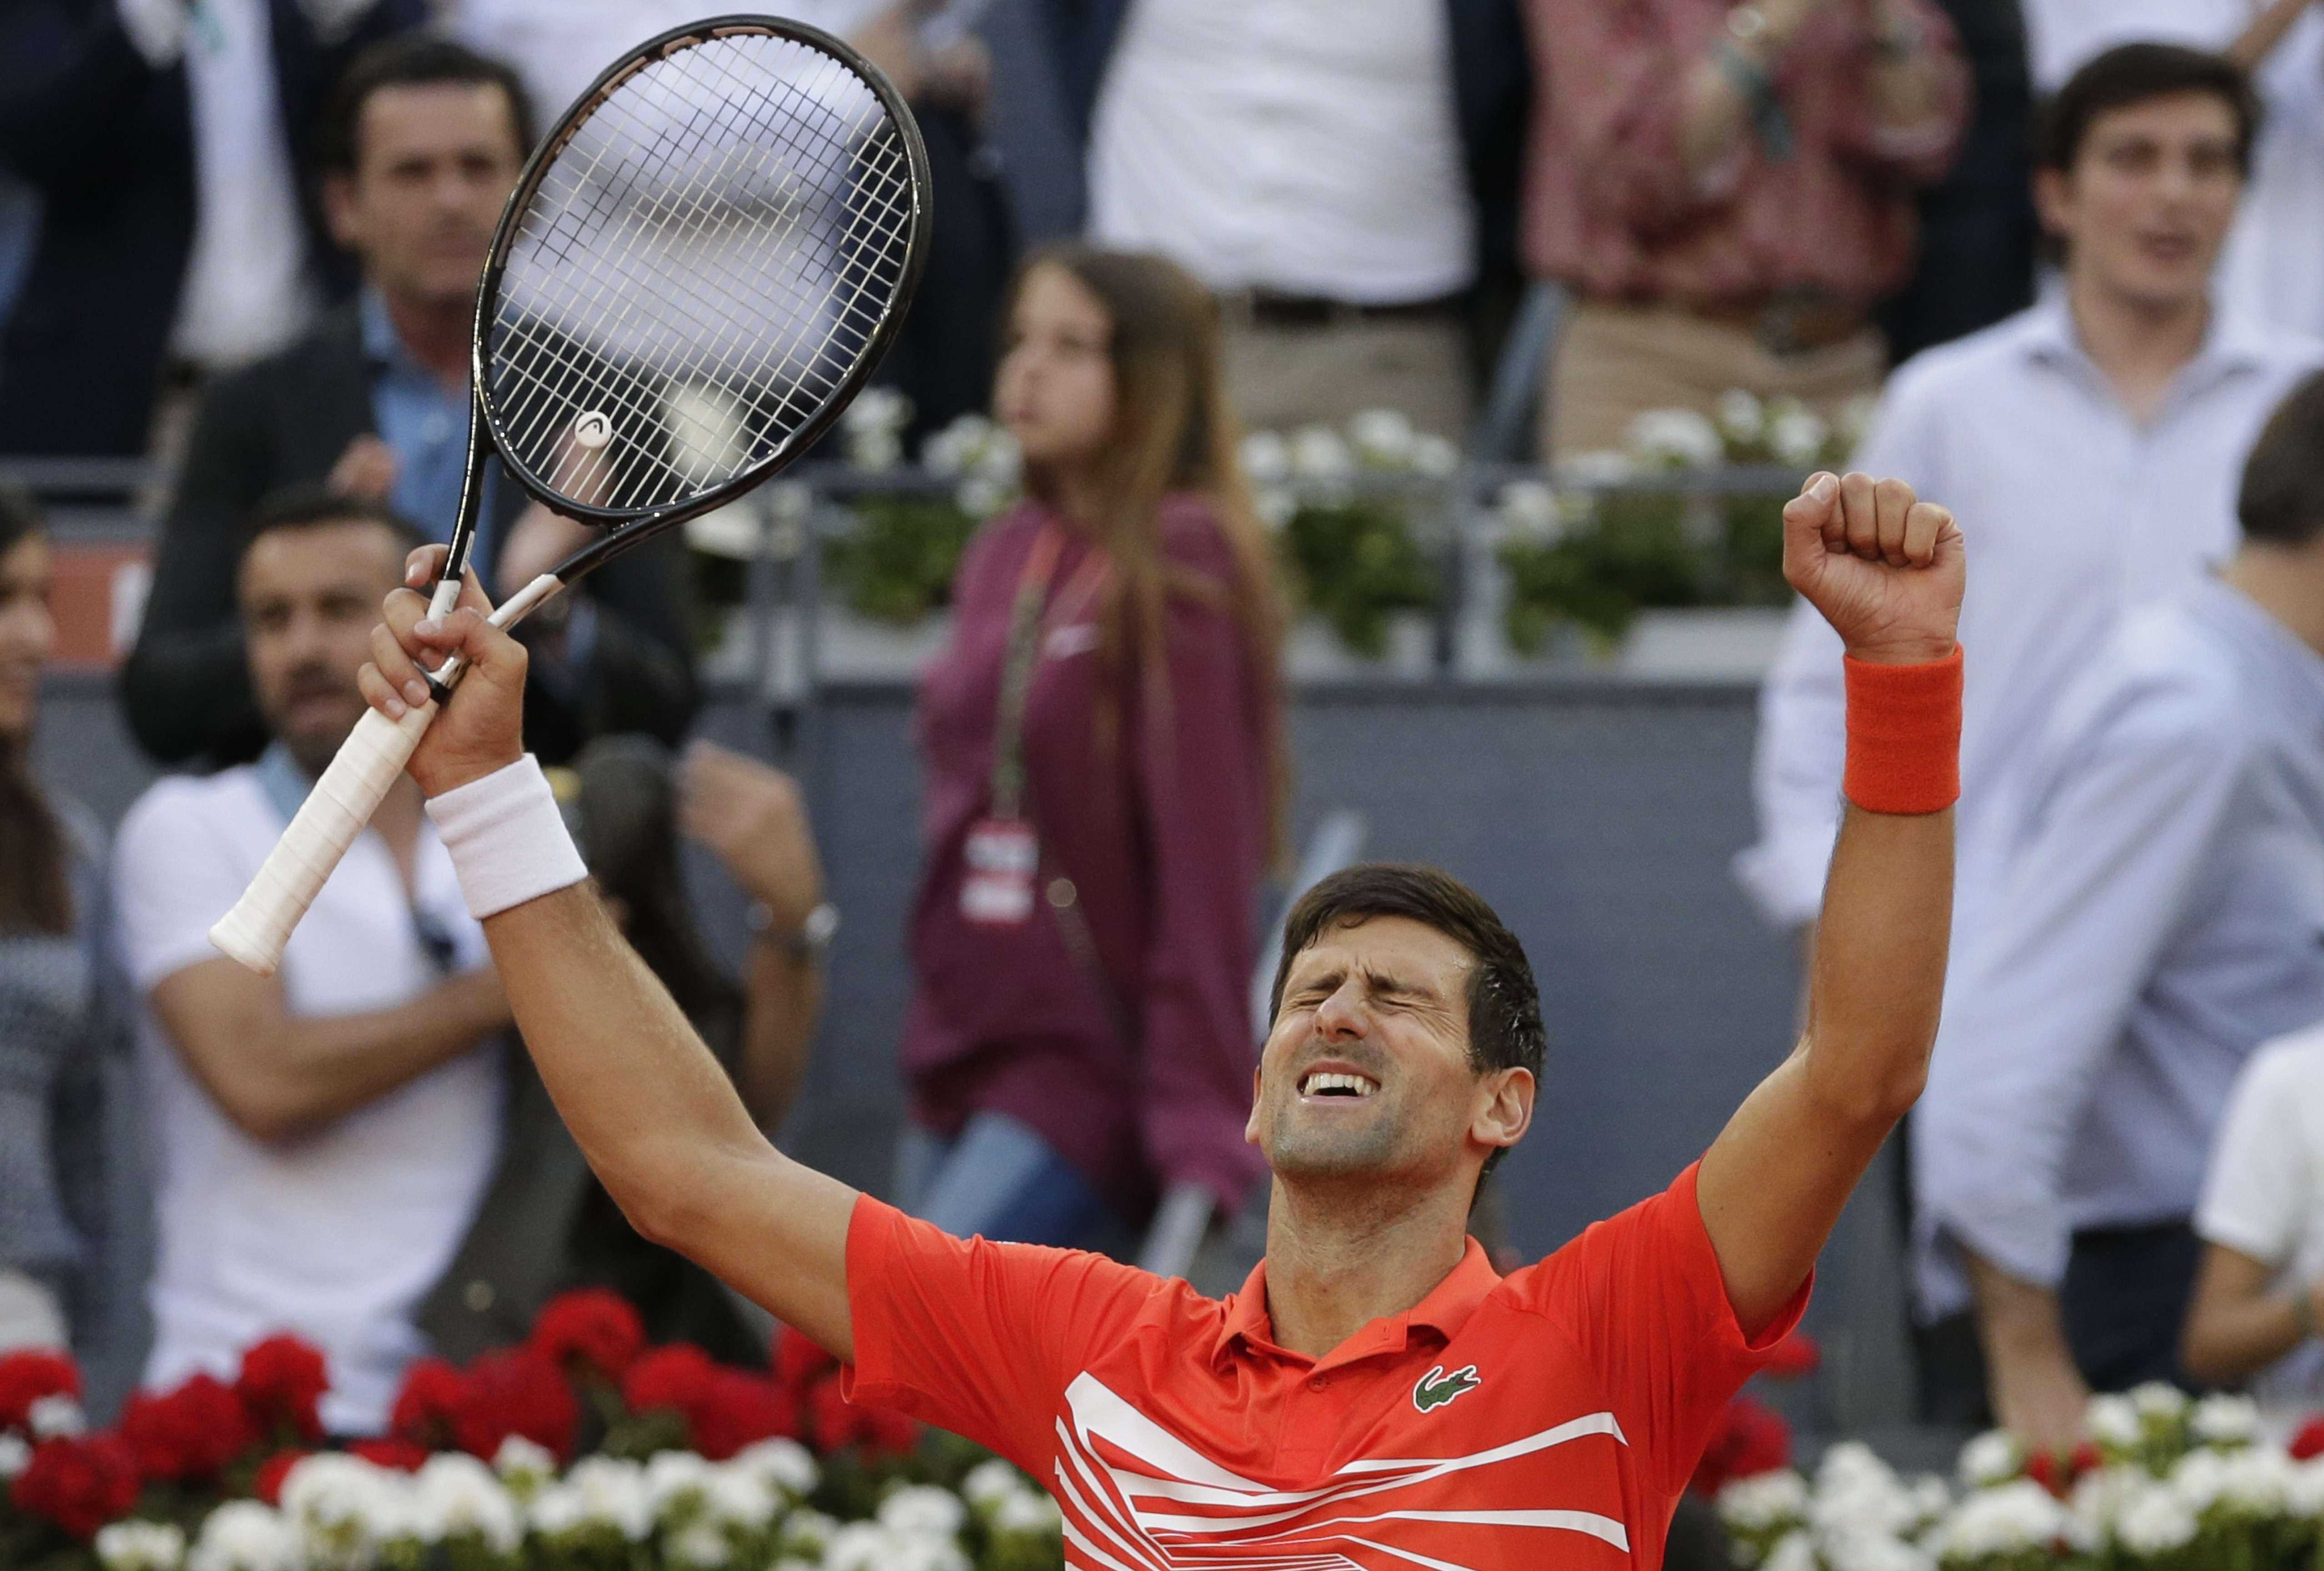 Djokovic derrota a Tsitsipas y gana su 3er título de Madrid